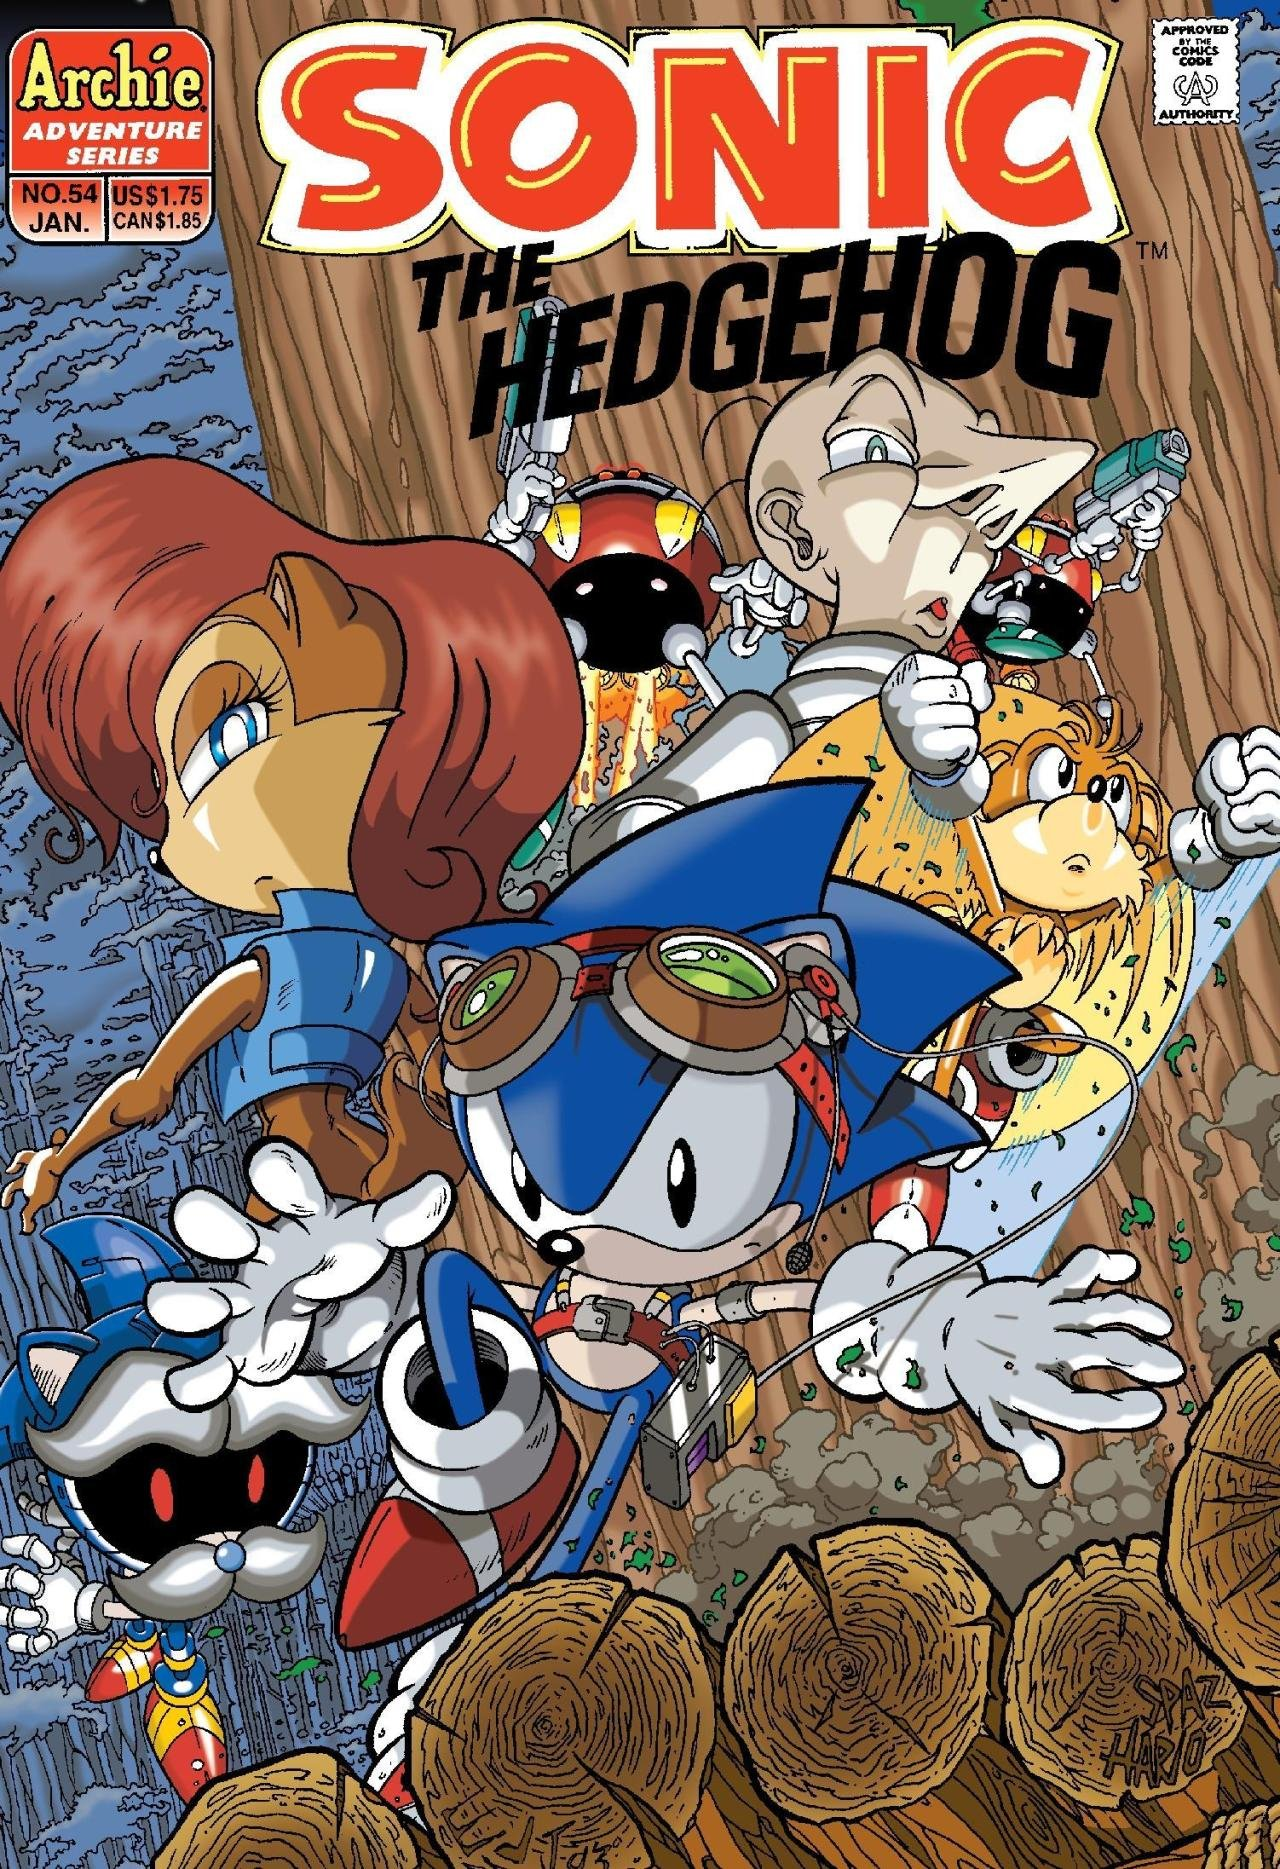 Sonic the Hedgehog 054 (January 1998)